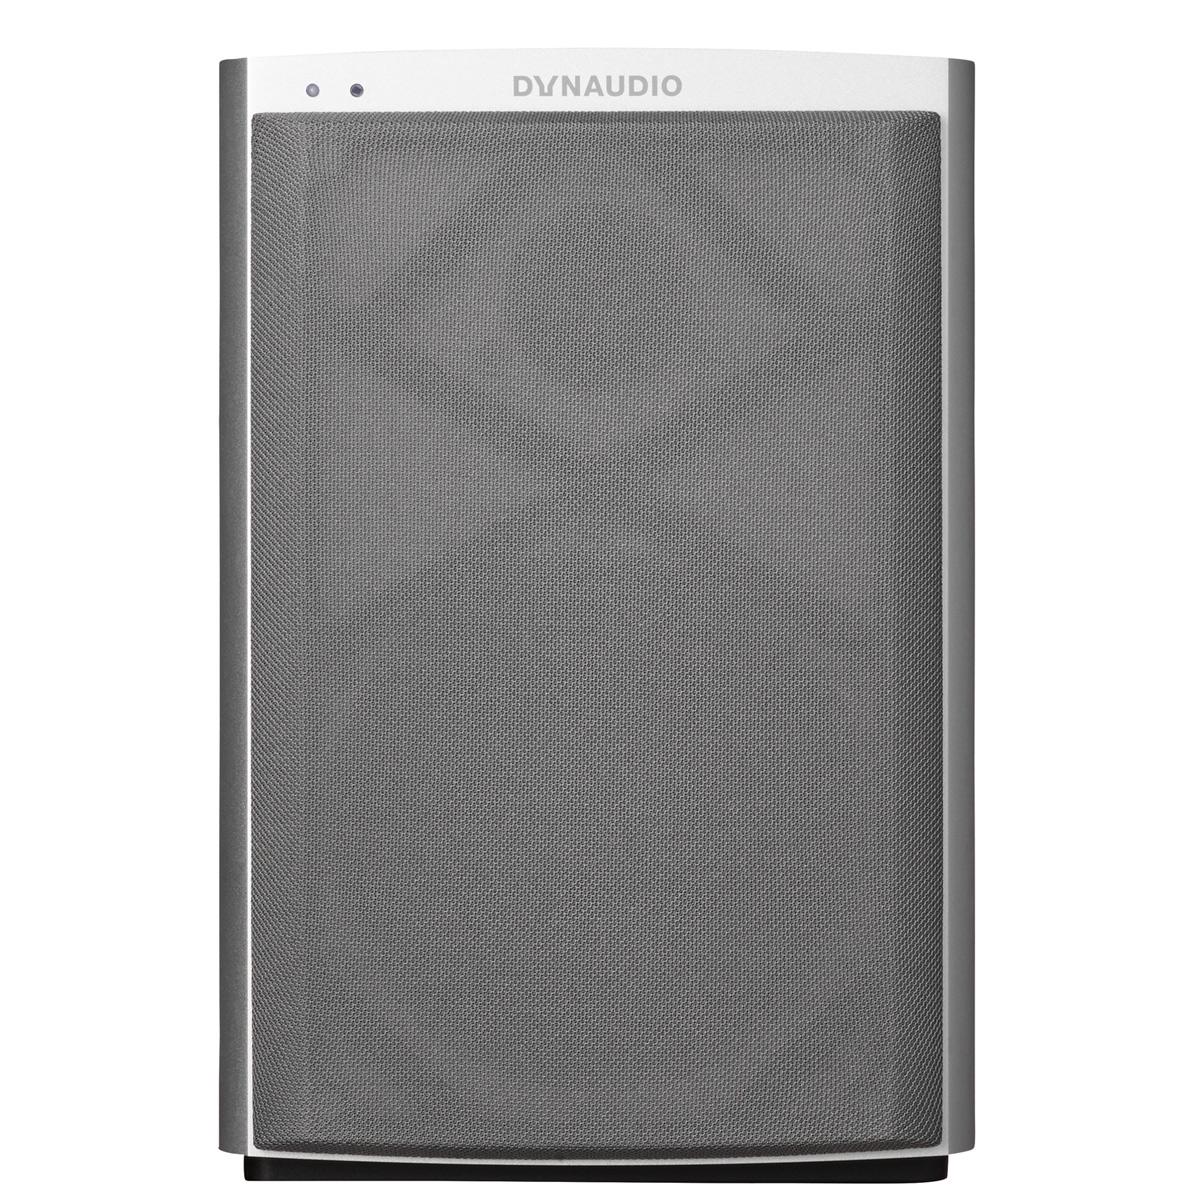 Dynaudio-Xeo-2-Wireless-Bookshelf-Speakers-Pair thumbnail 32